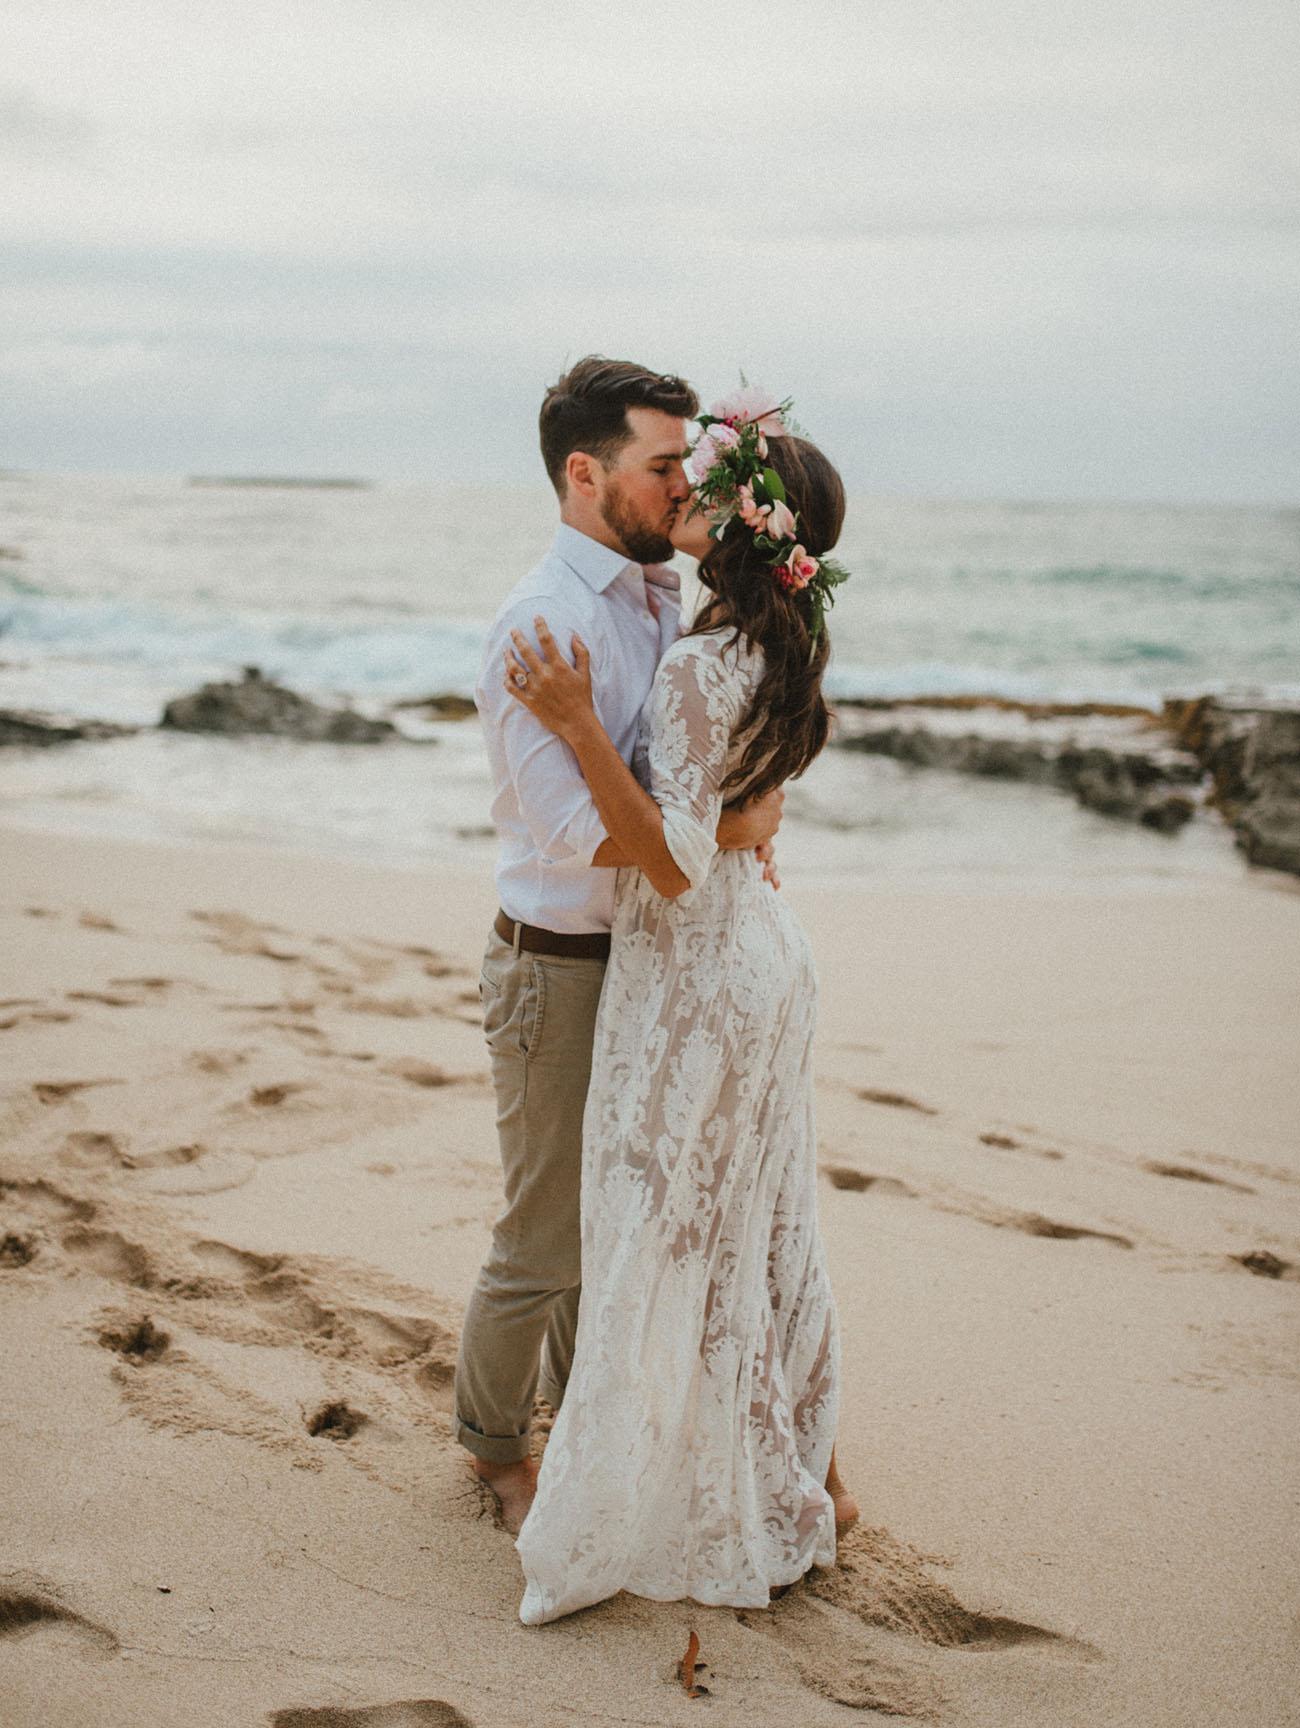 Stunning Surprise Beach Proposal Green Wedding Shoes